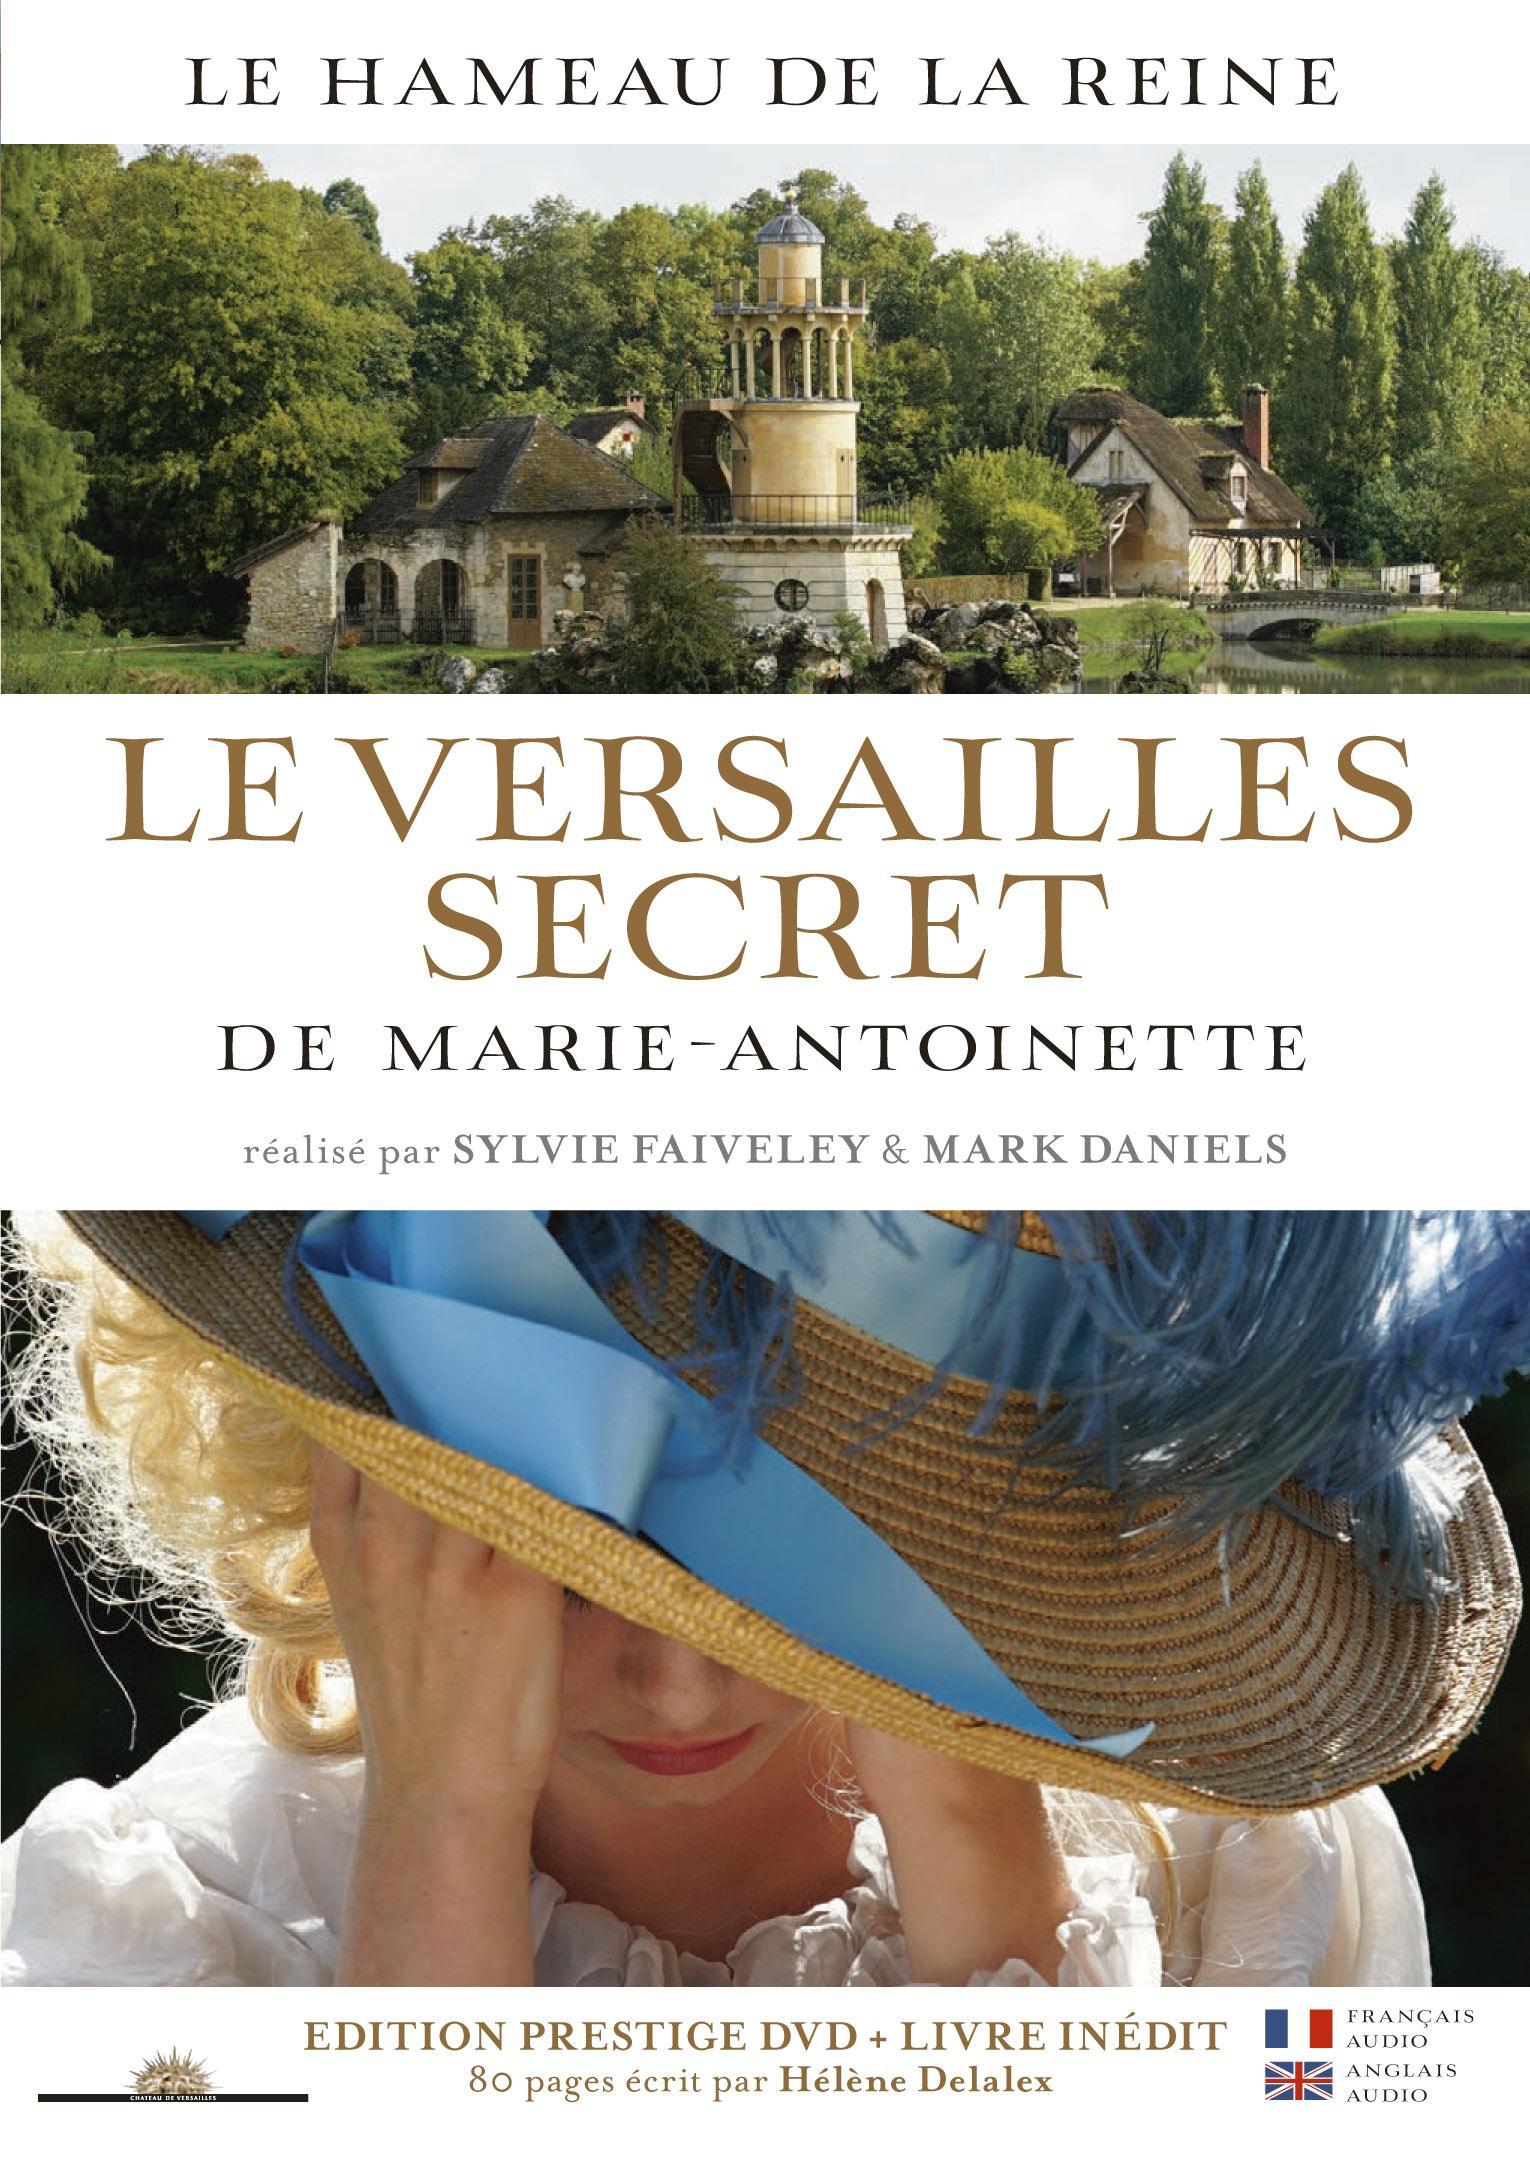 Тайный Версаль Марии-Антуанетты - The Secret Versailles of Marie-Antoinette